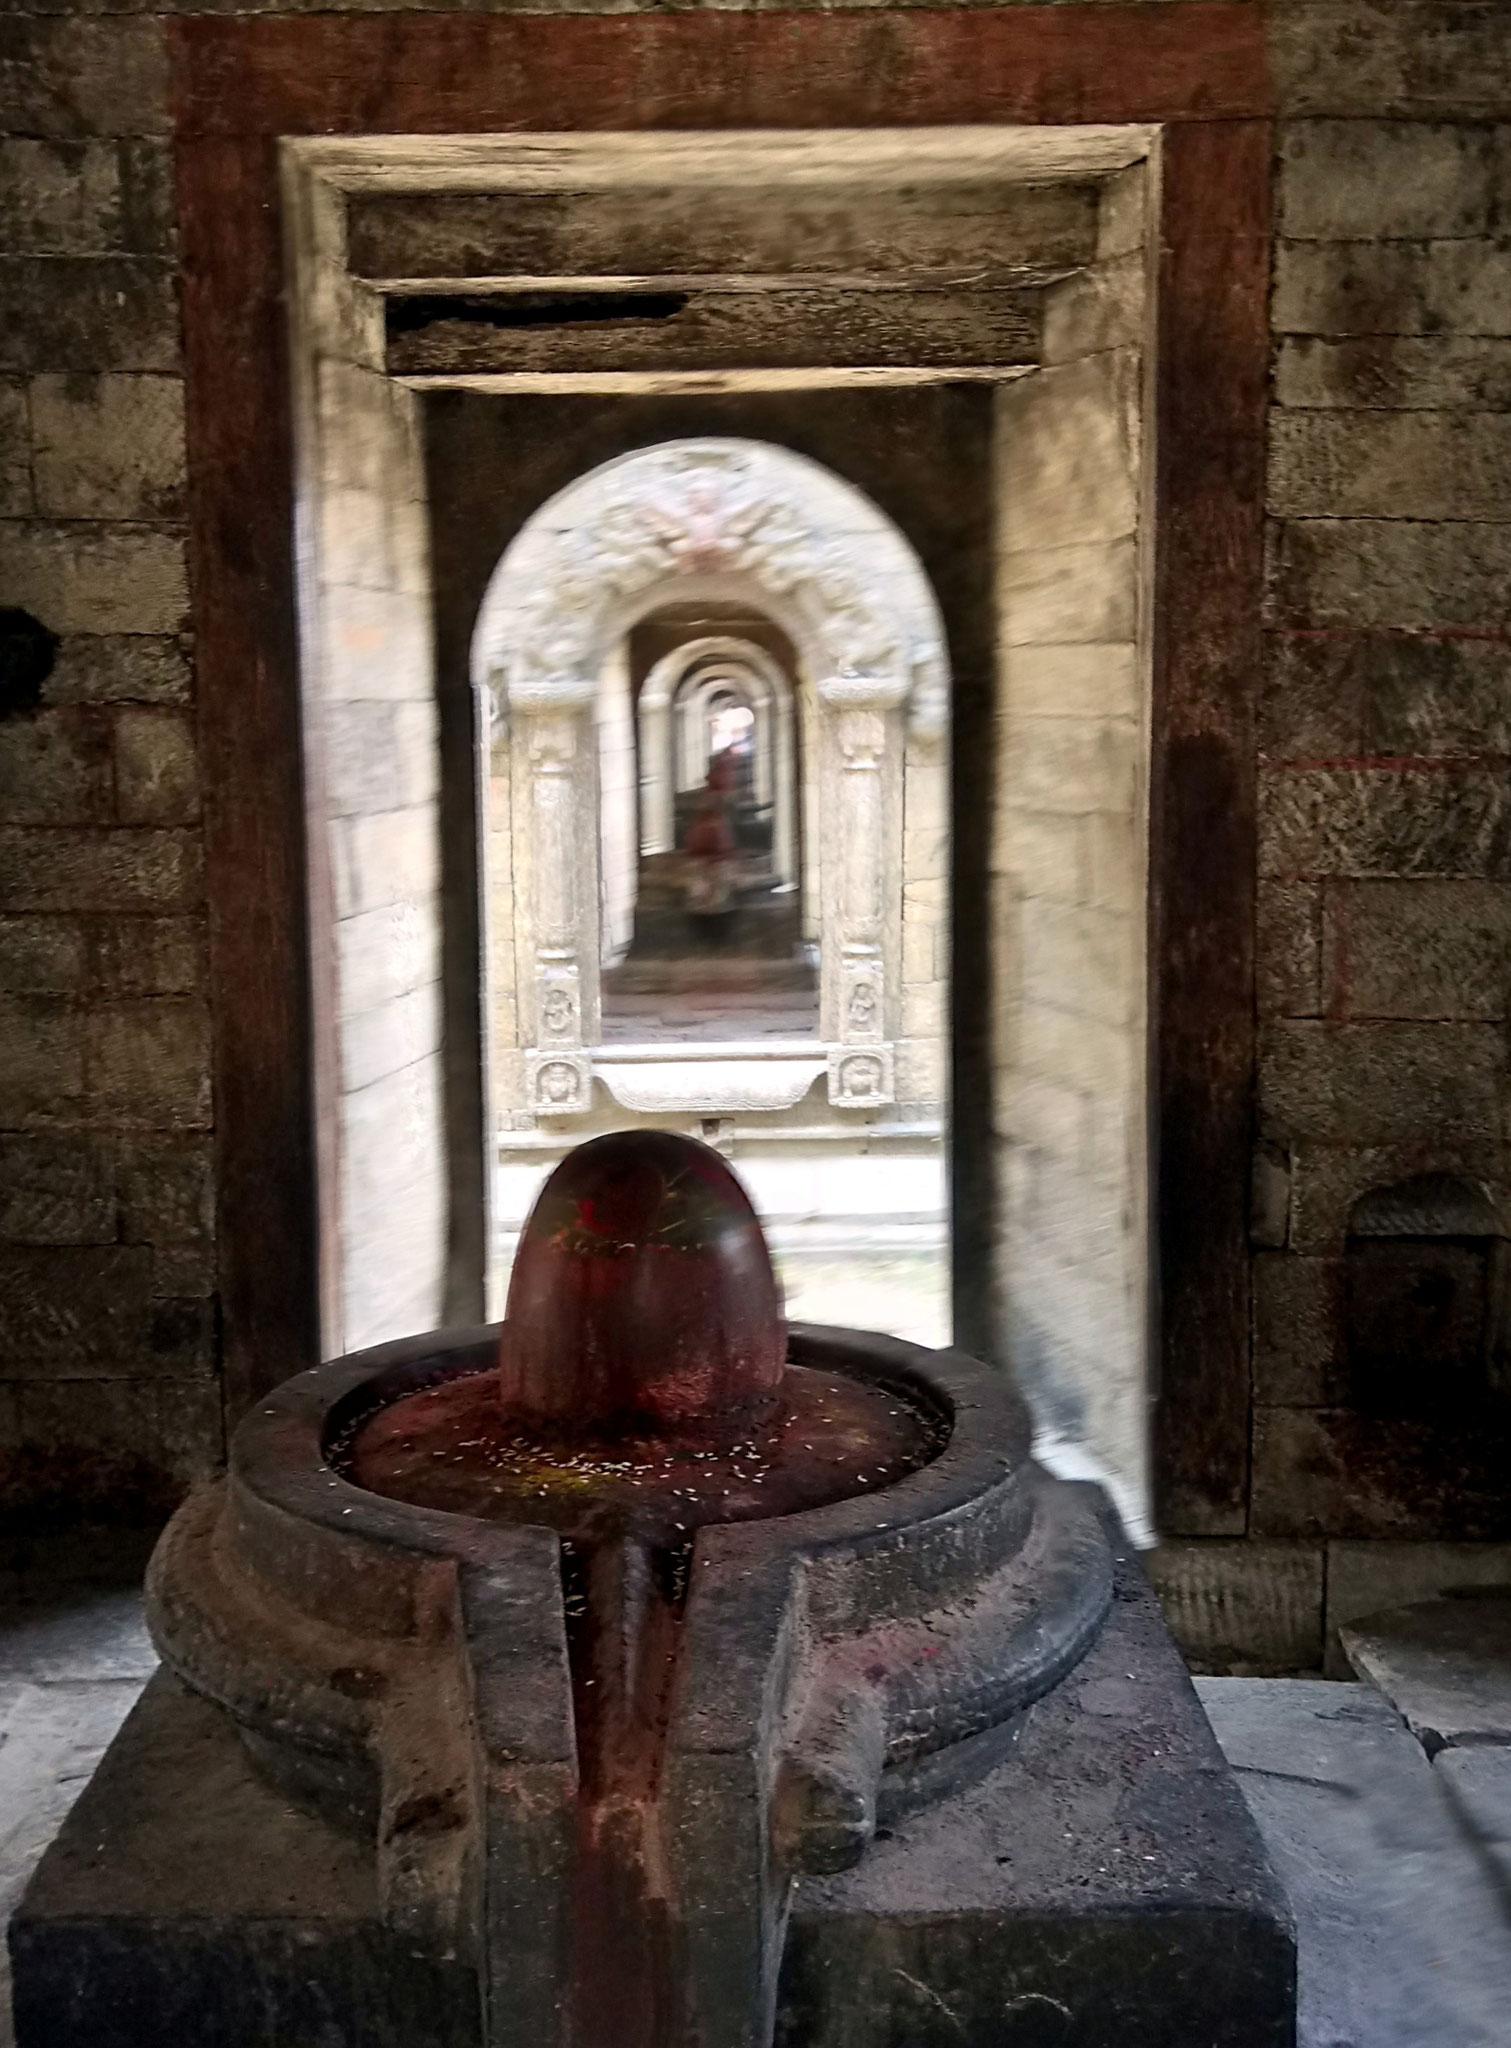 temples en enfilade